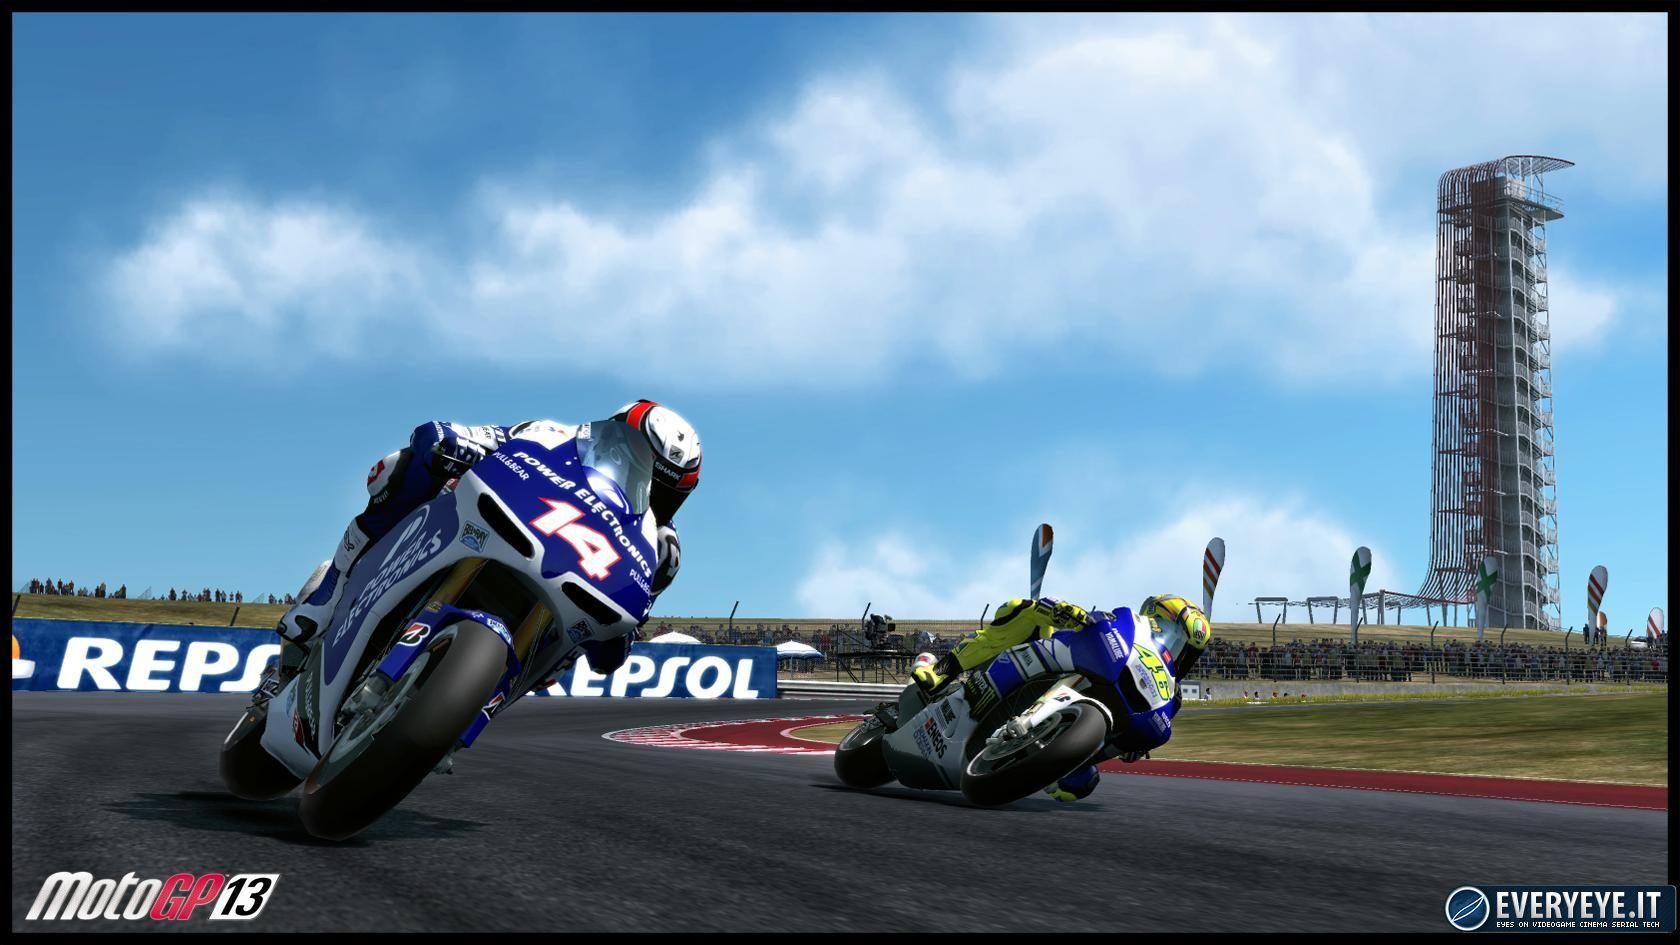 MotoGP 13: ecco la data della demo! - Everyeye.it